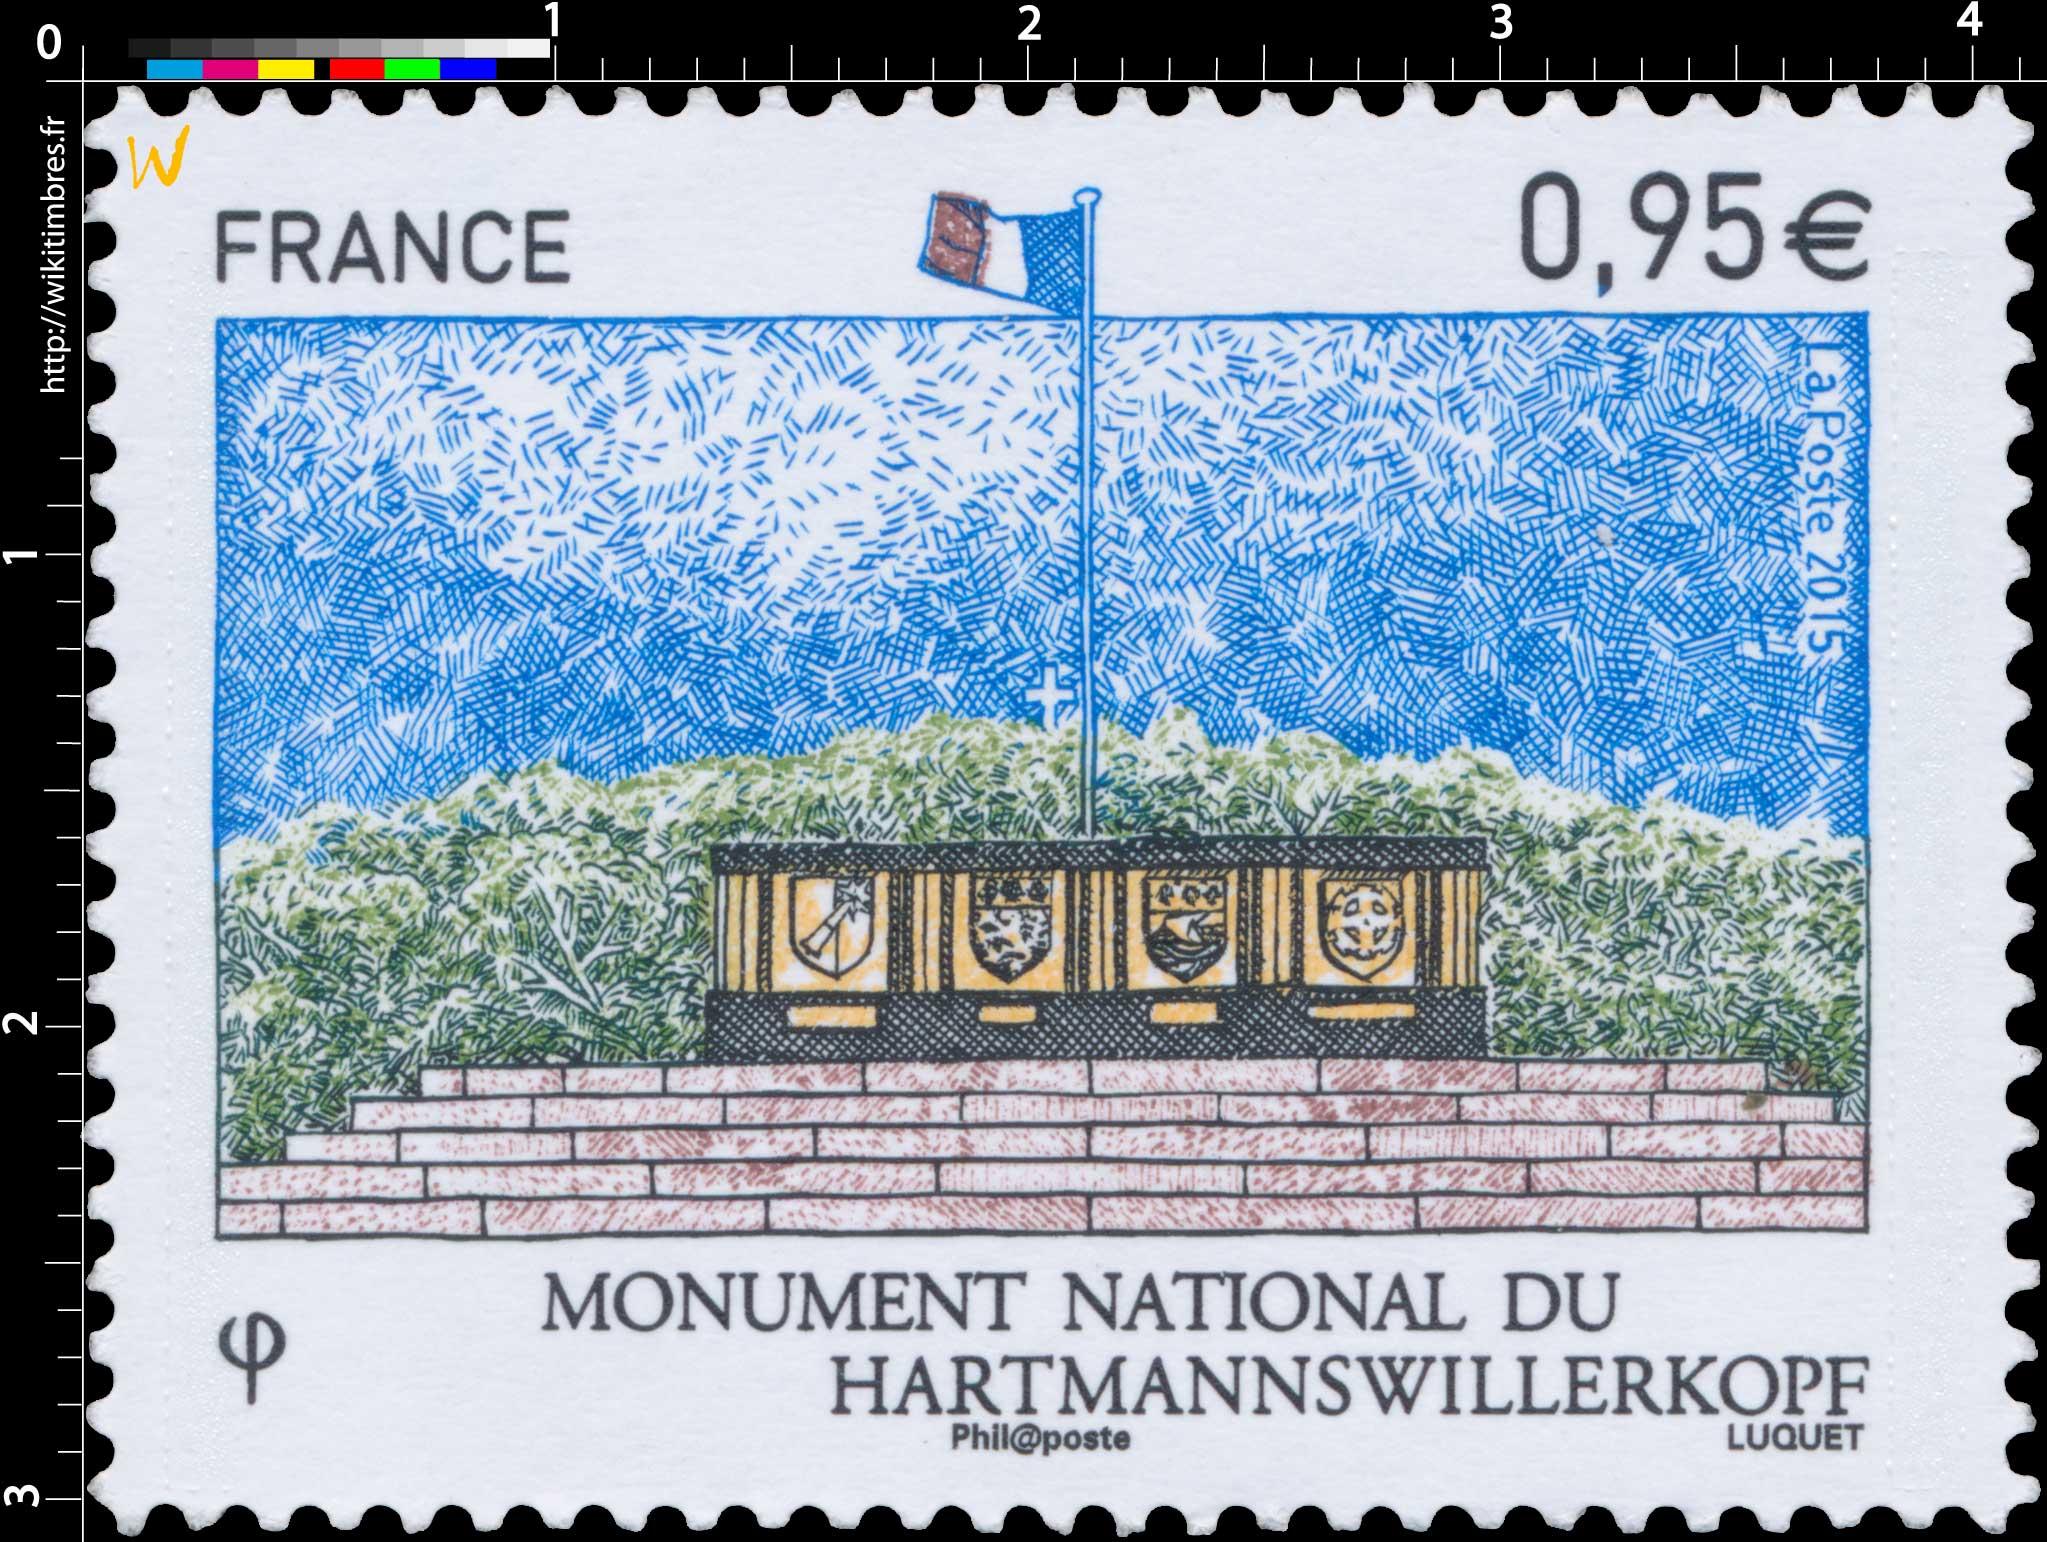 2015 Monument National du Hartmannswillerkopf